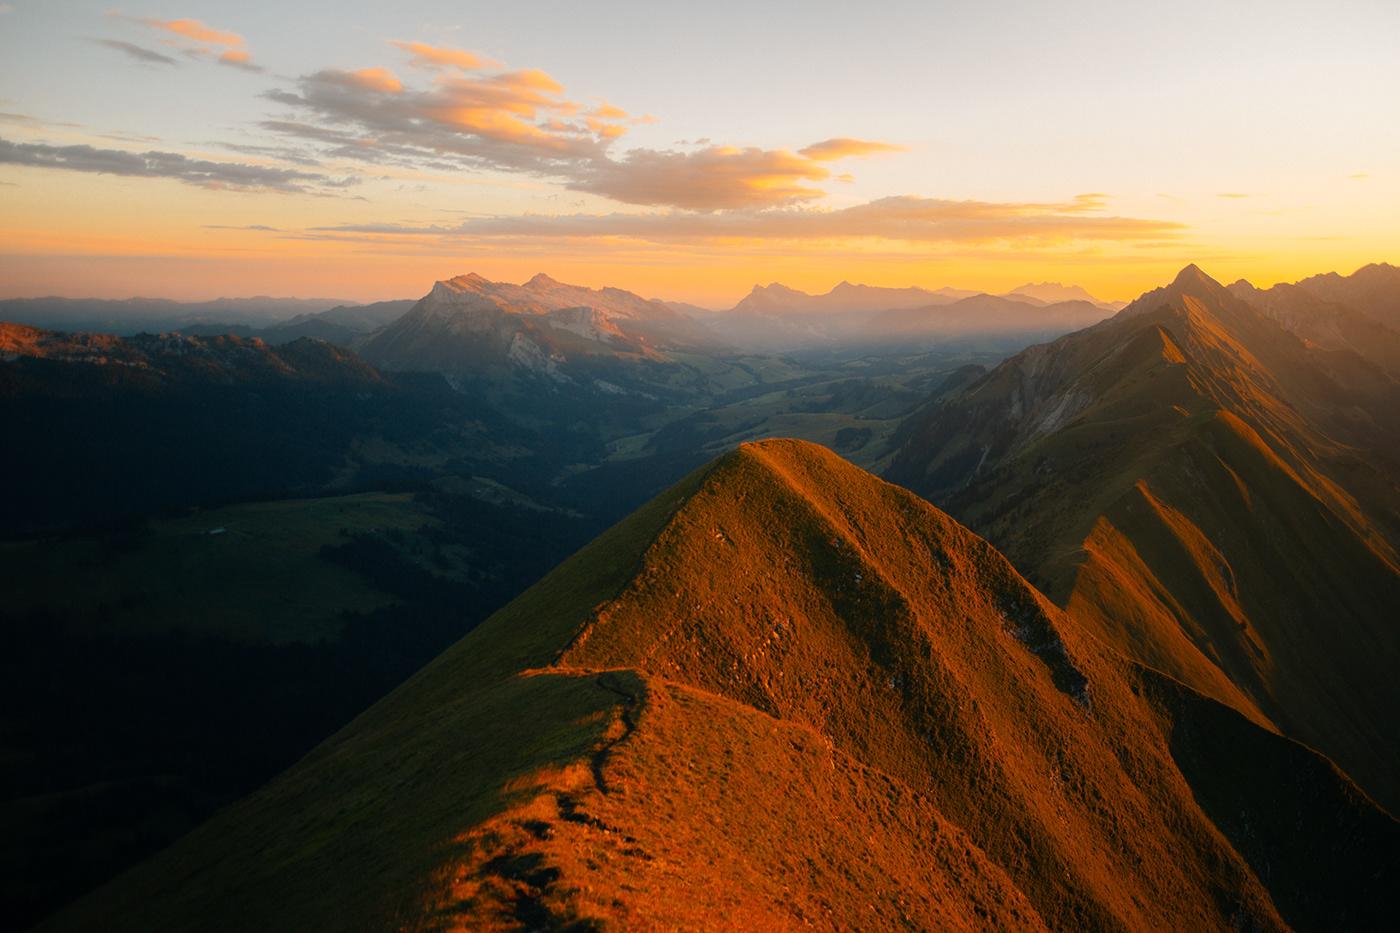 Landscape,mountains,Nature,outdoors,Switzerland,Travel,hiking,Sunrise,sunset,friends